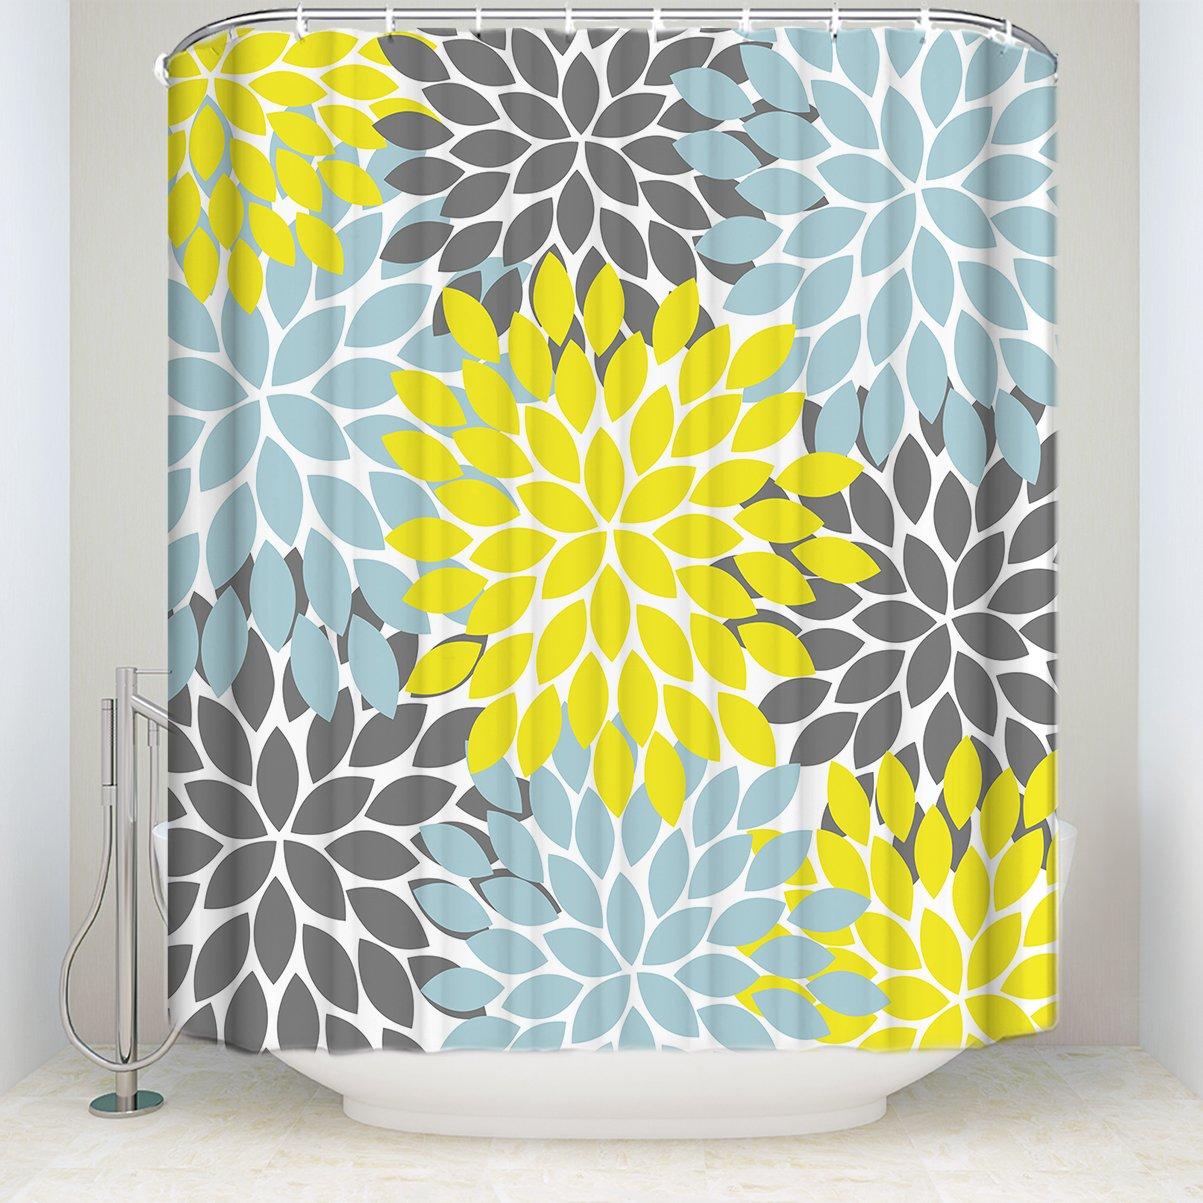 ZL Home Dahlia Shower Curtain Multicolor Pinnata Flower Pattern Print Waterproof Fabric Polyester Custom Bathroom Sets Yellow Gray